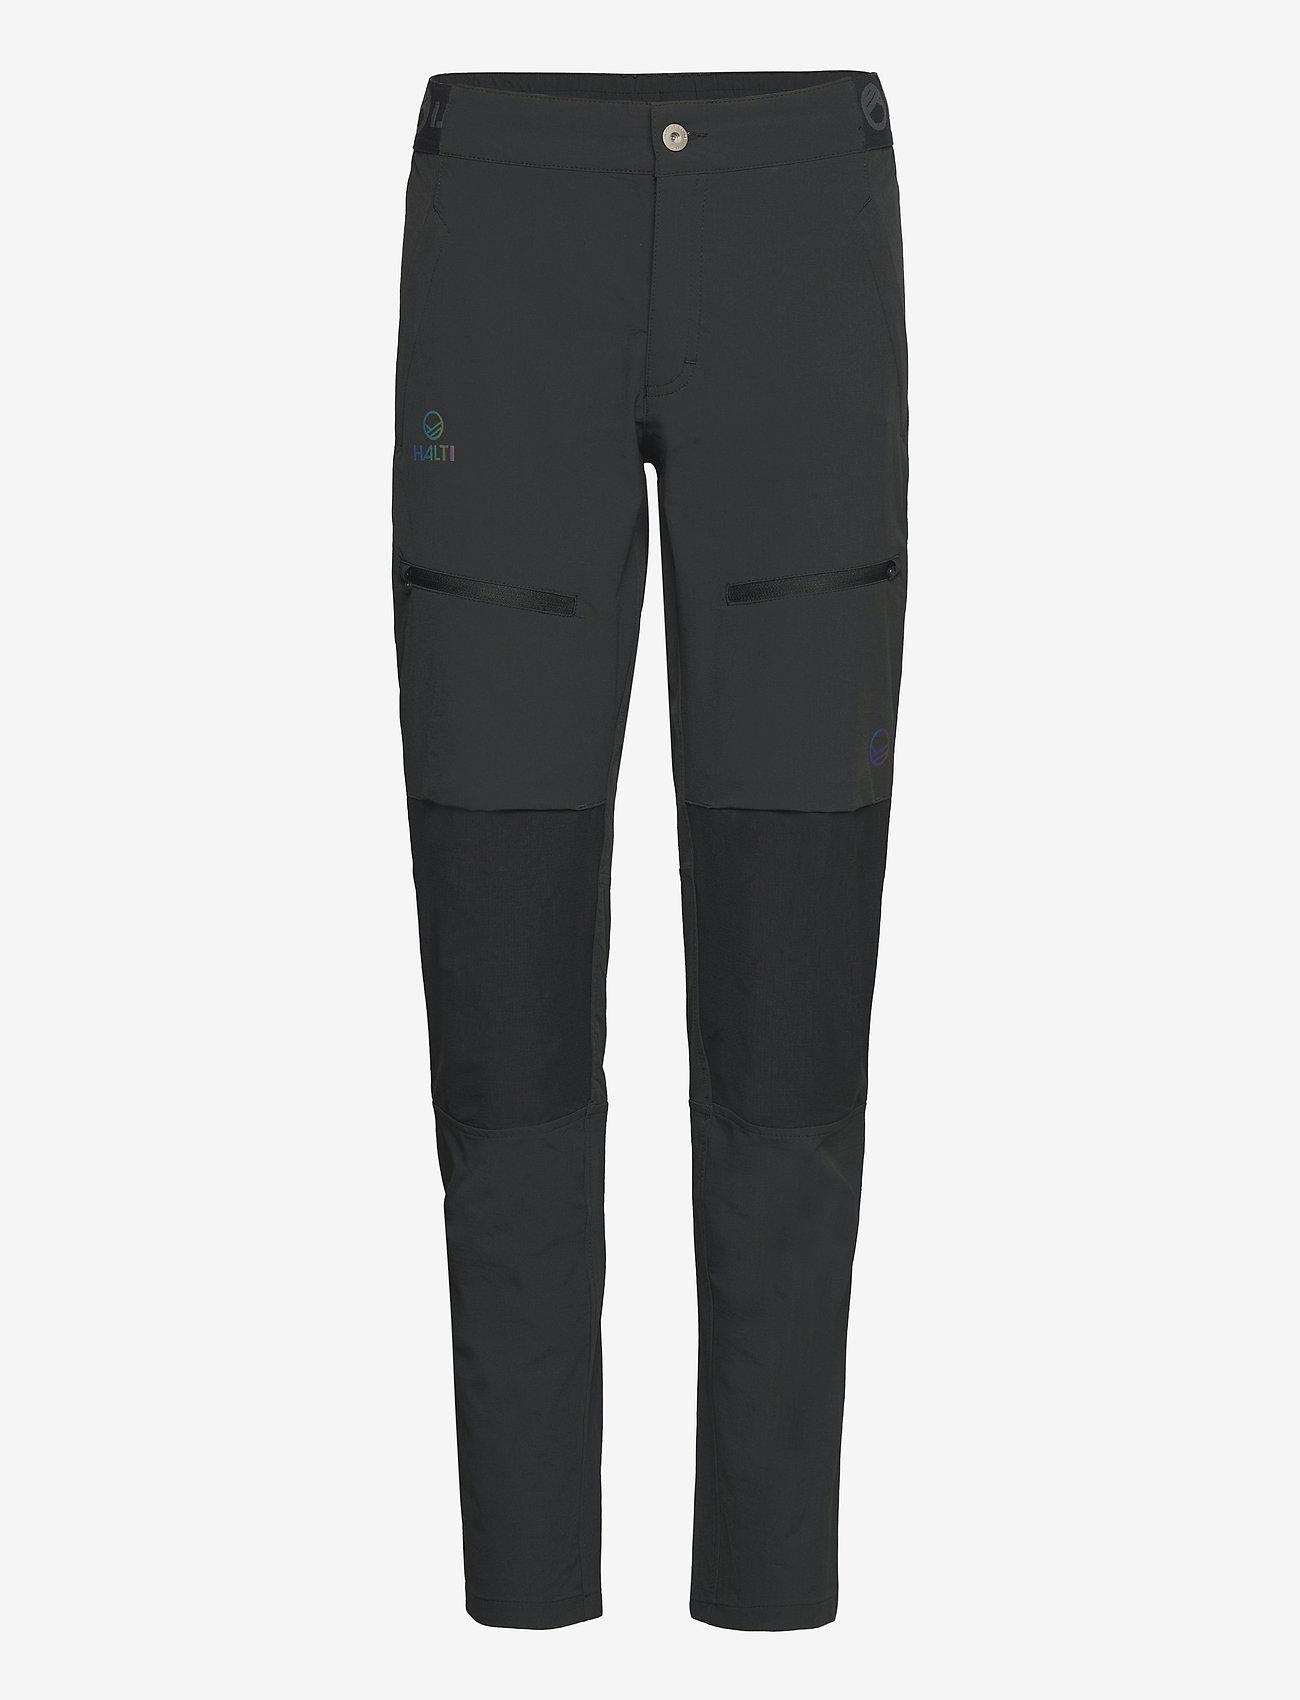 Halti - Pallas II Women's X-stretch Pants - friluftsbukser - anthracite grey - 0